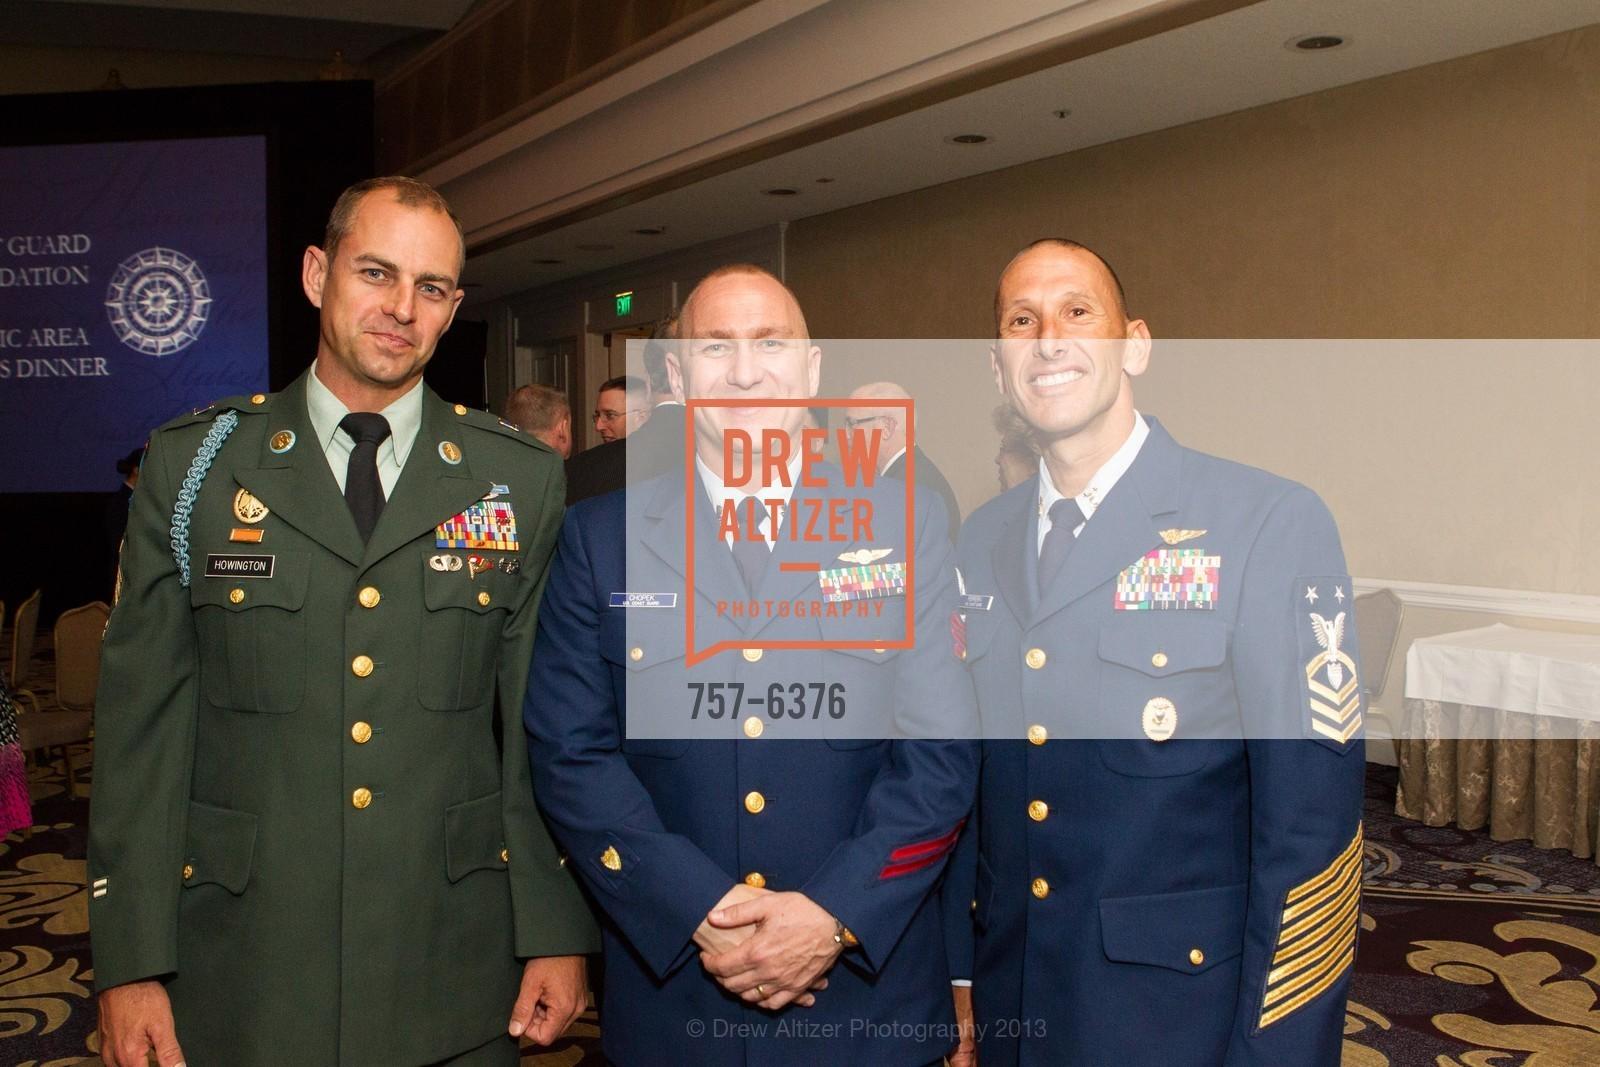 John Howington, Steve Chopek, Mike Ferreria, COAST GUARD FOUNDATION Presents Pacific Awards Dinner, US, April 25th, 2013